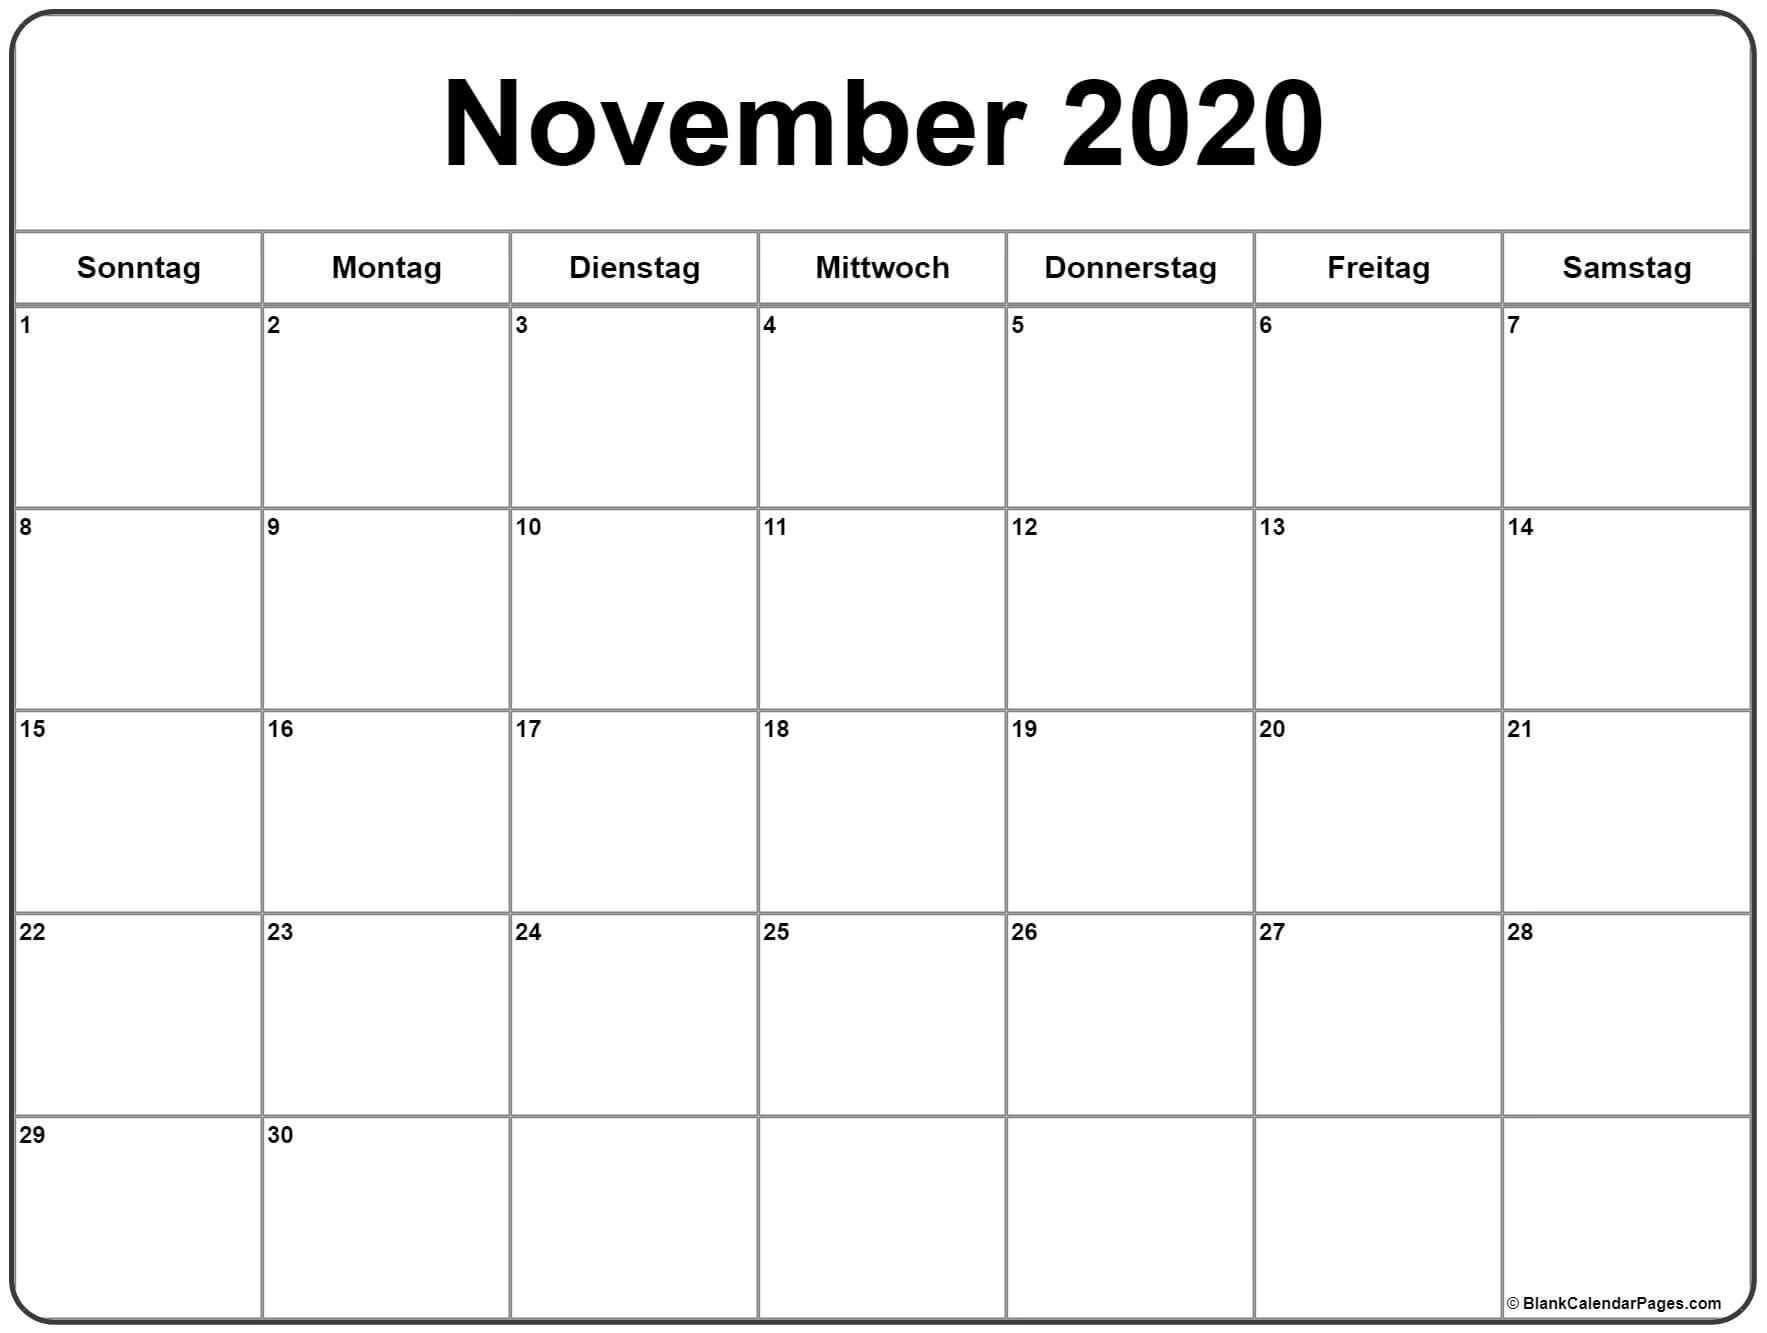 November Kalender 2020